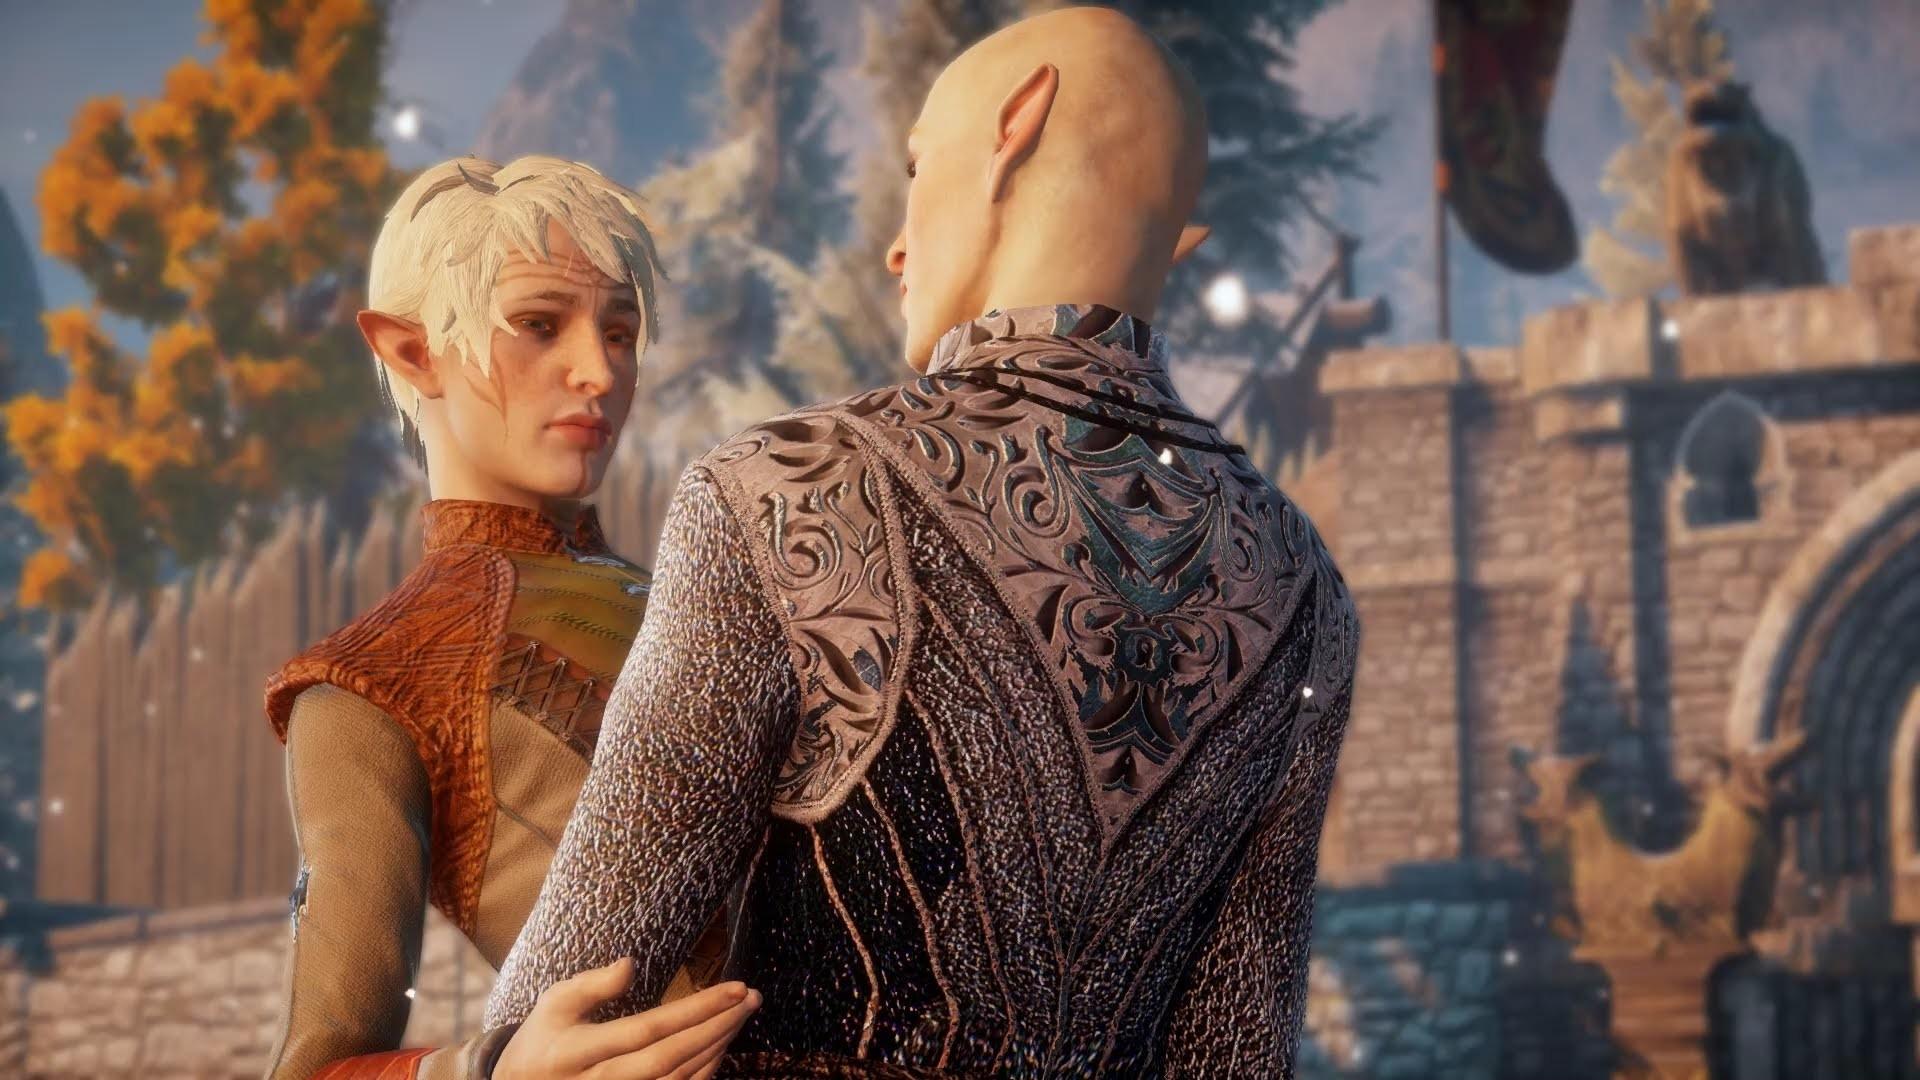 Dragon Age Inquisition Solas & Male Elf Romance First Kiss in the Fade (Bi  Solas Mod) – YouTube